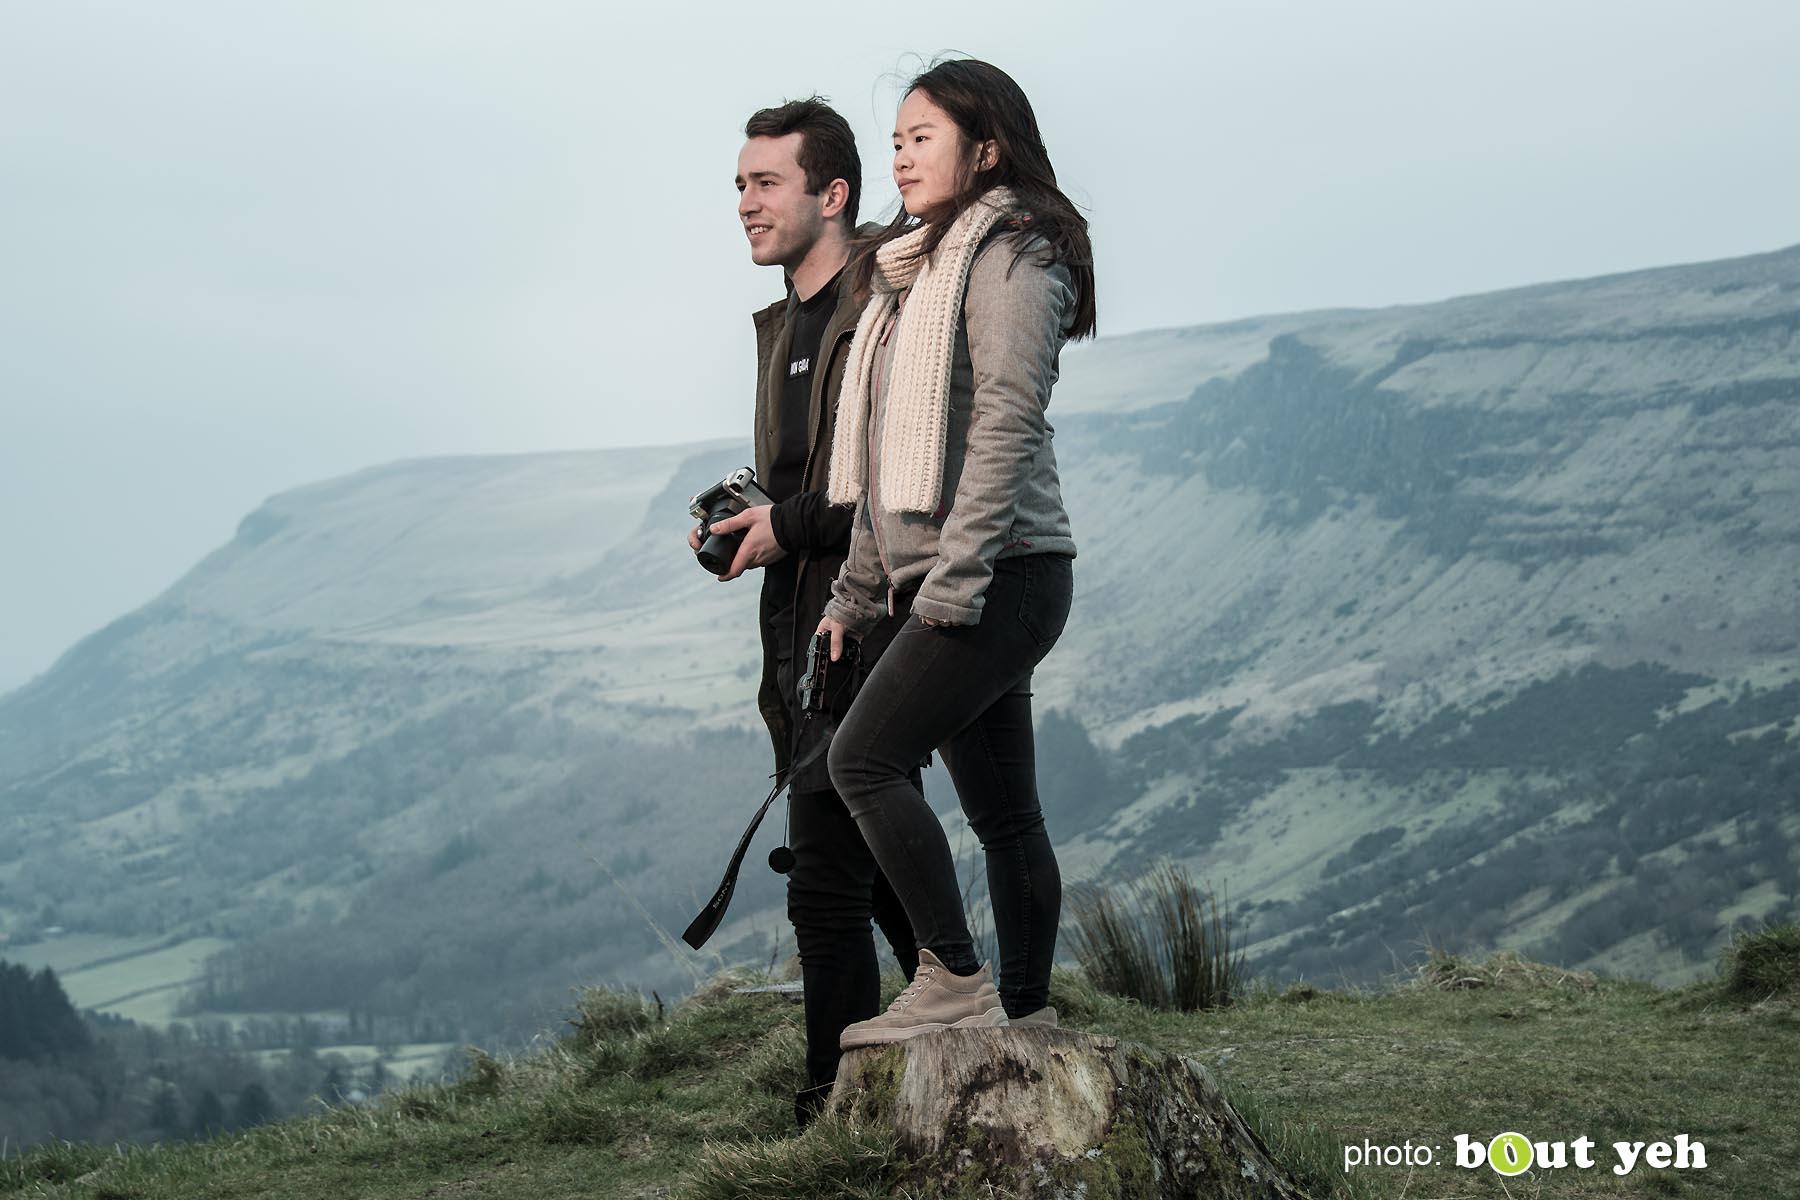 Maikel and Mai-Lin, Glenariff Forest, Northern Ireland. Photo 0650.